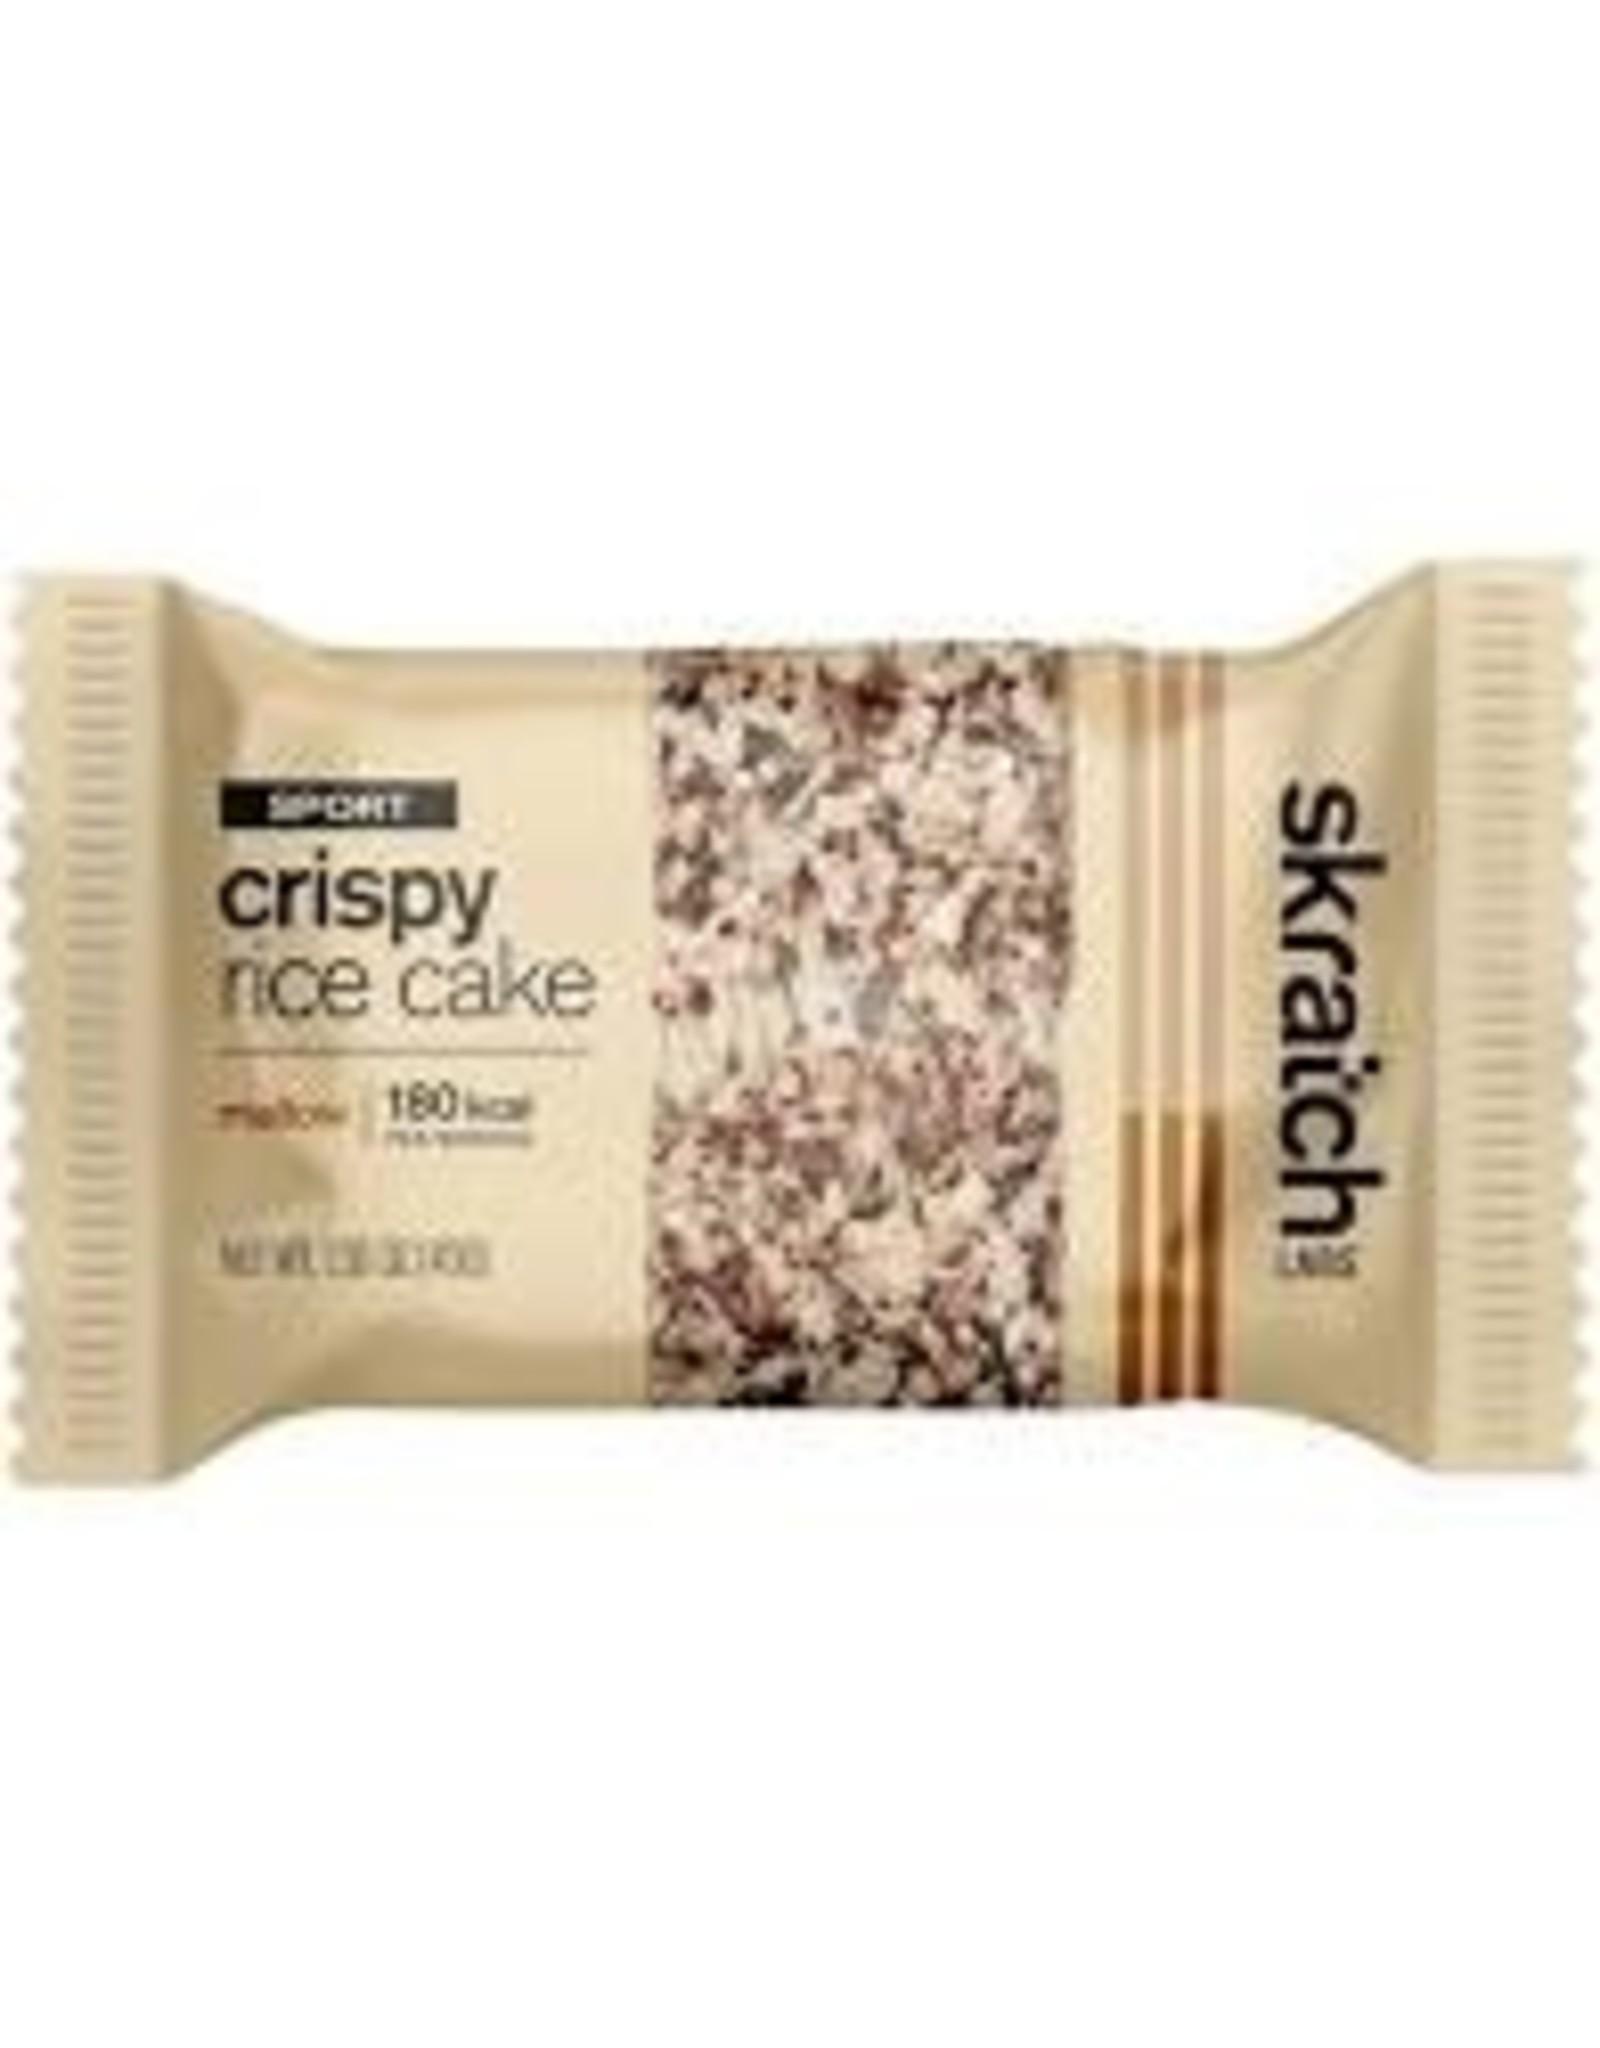 Skratch Labs Skratch Labs Crispy Rice Cake Bar - Mallow, Box of 8 single